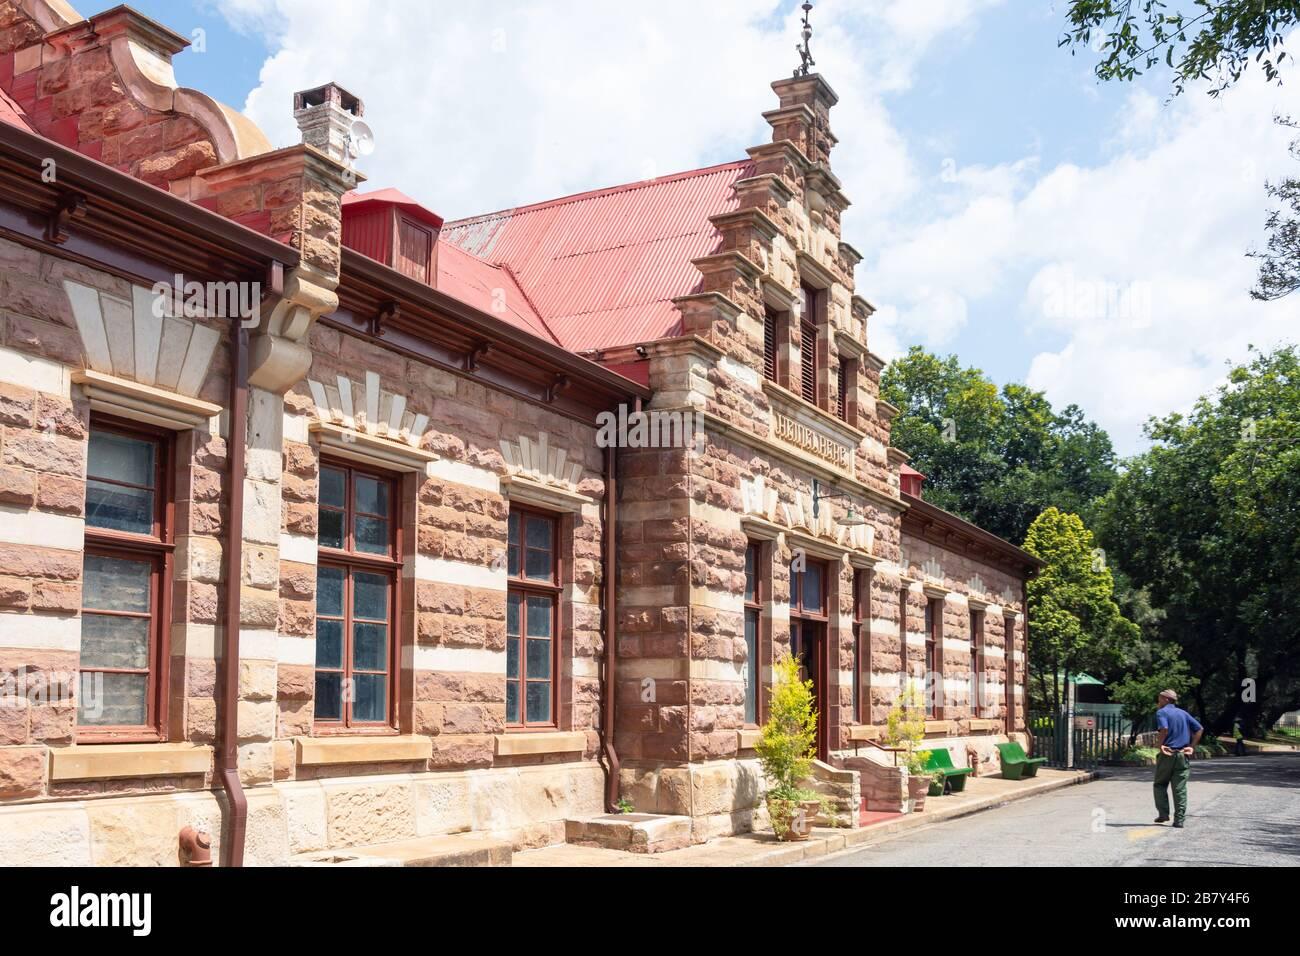 Heidelberg Heritage Museum, Voortrekker Street, Heidelberg, Gauteng Province, Republic of South Africa Stock Photo